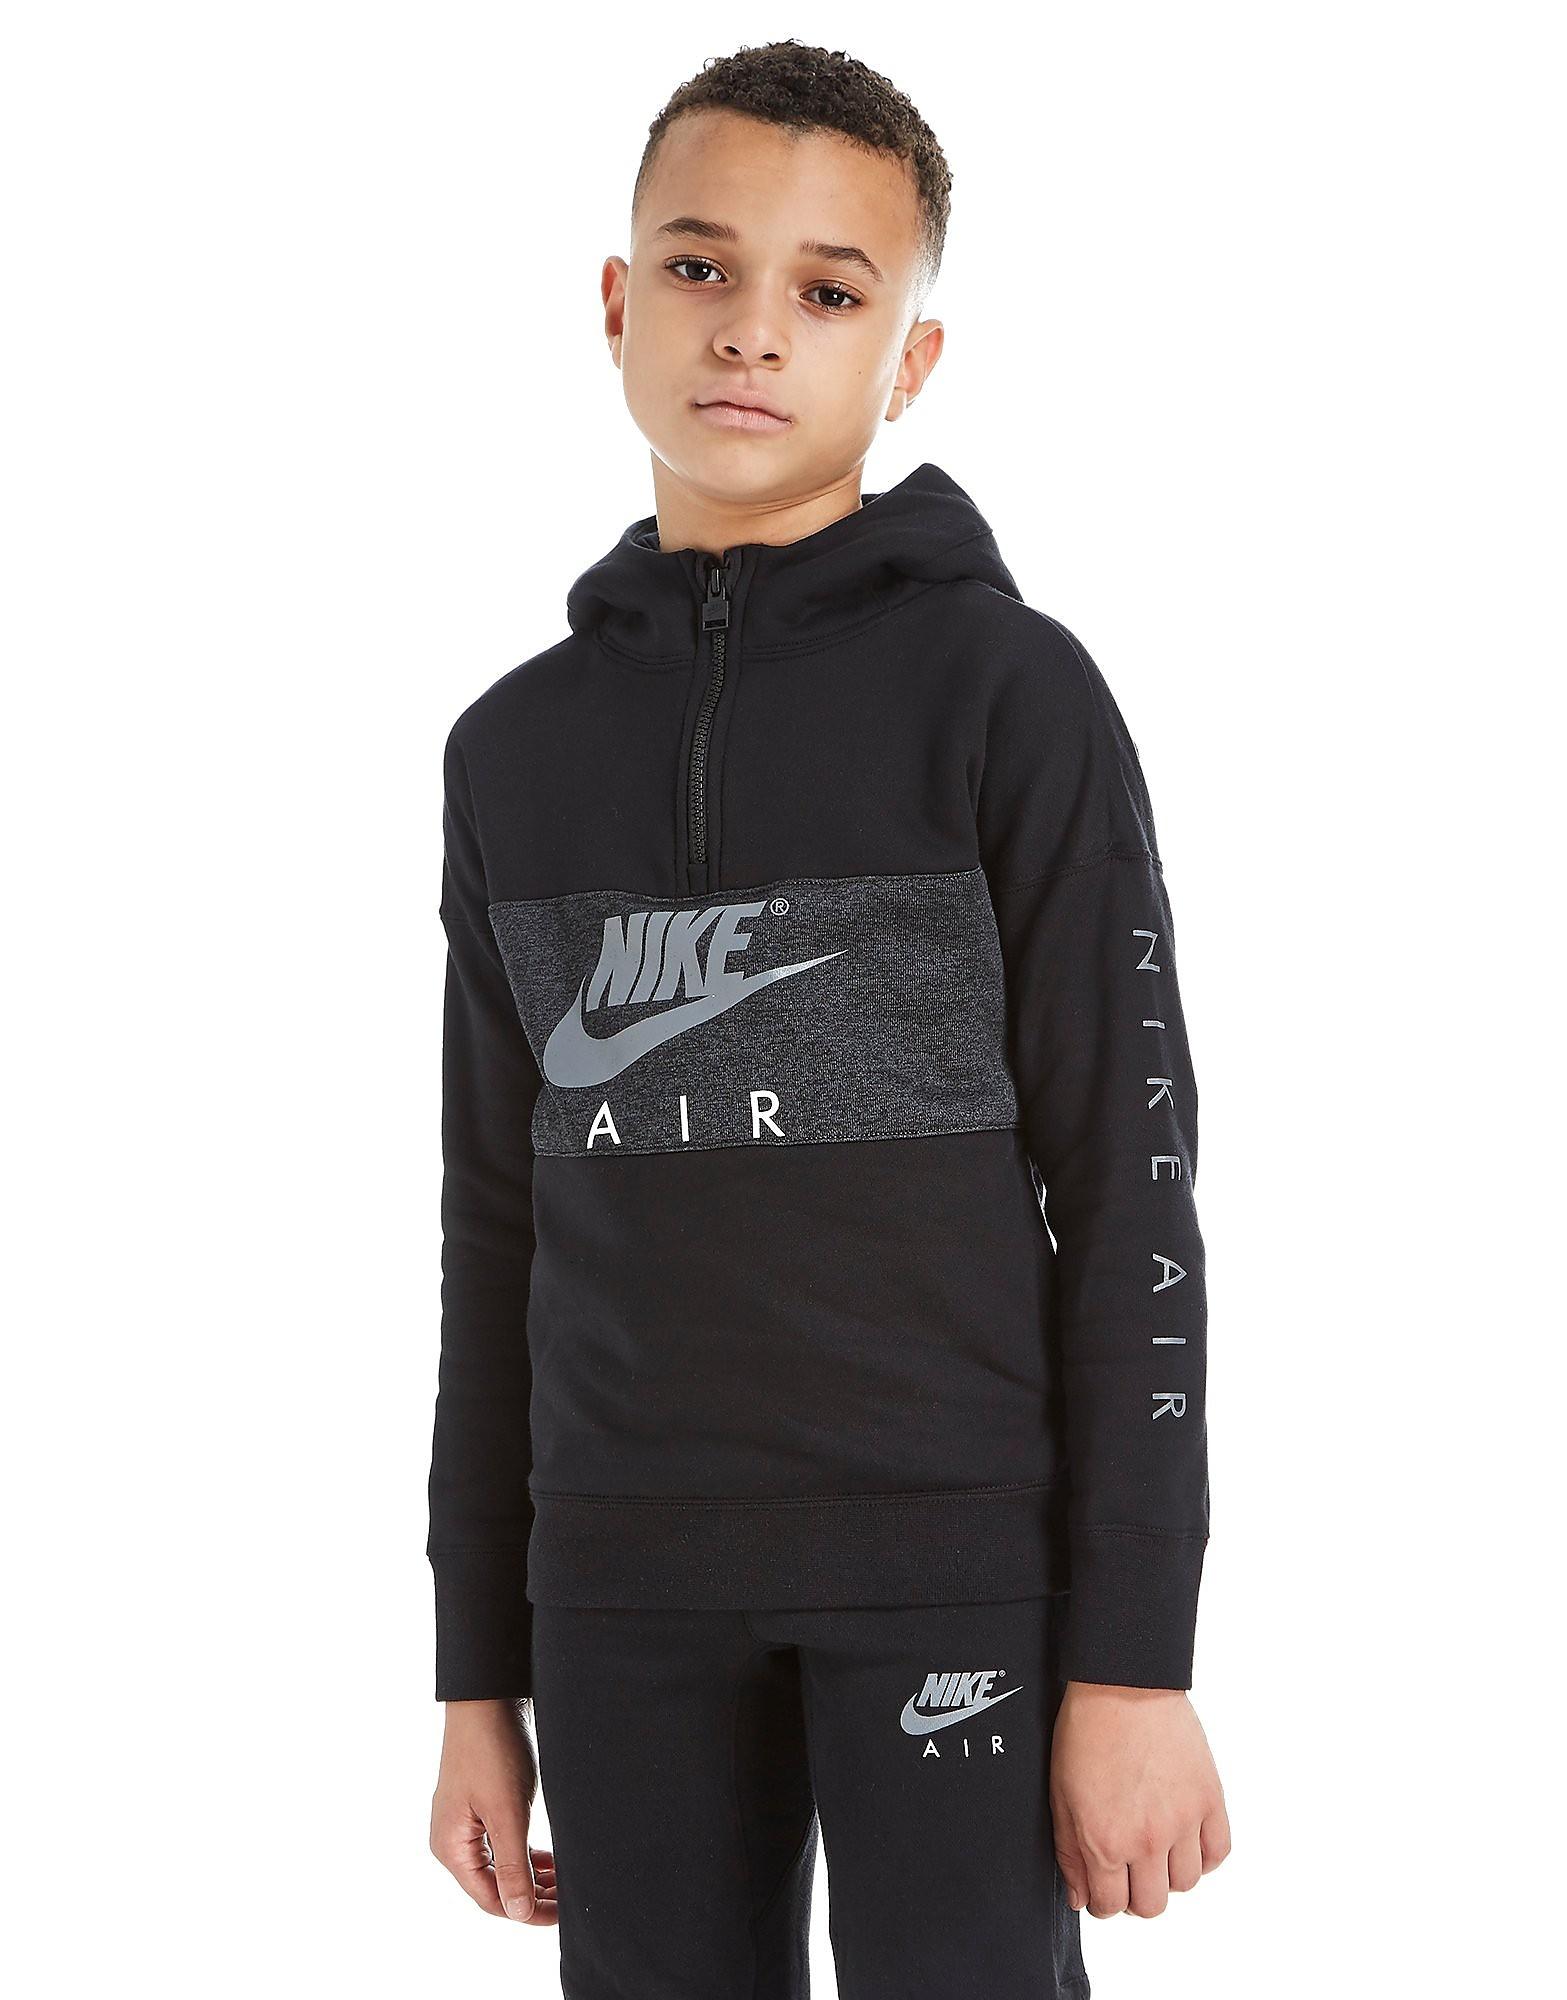 Nike Air Zip Hoody Junior